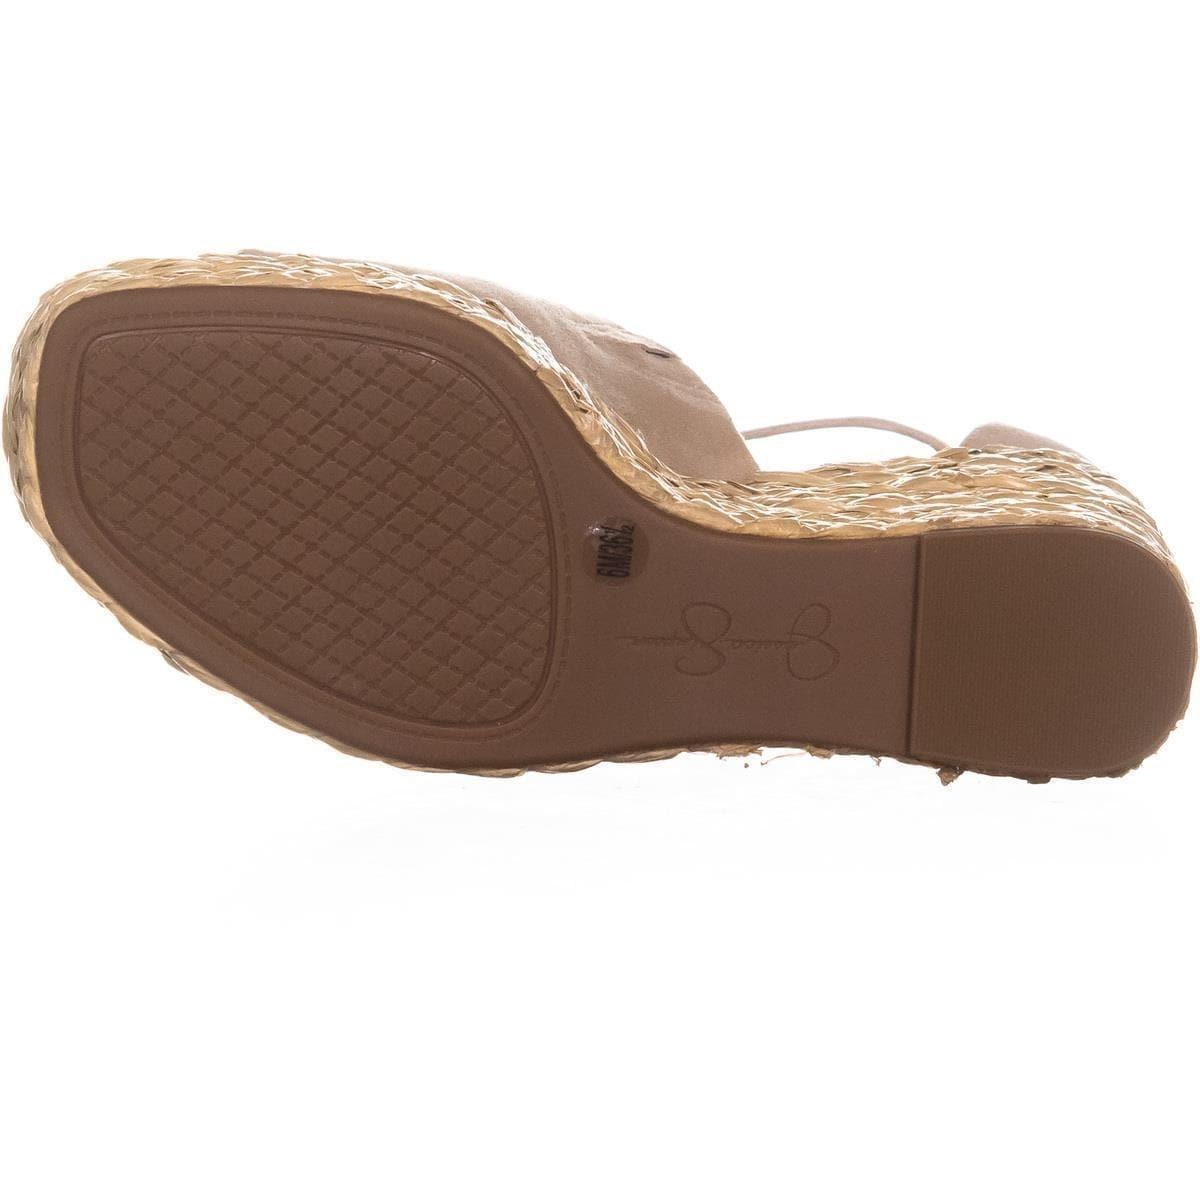 457c058a63e Jessica Simpson Suella Espadrilles Wedge Sandals, Sand Dune